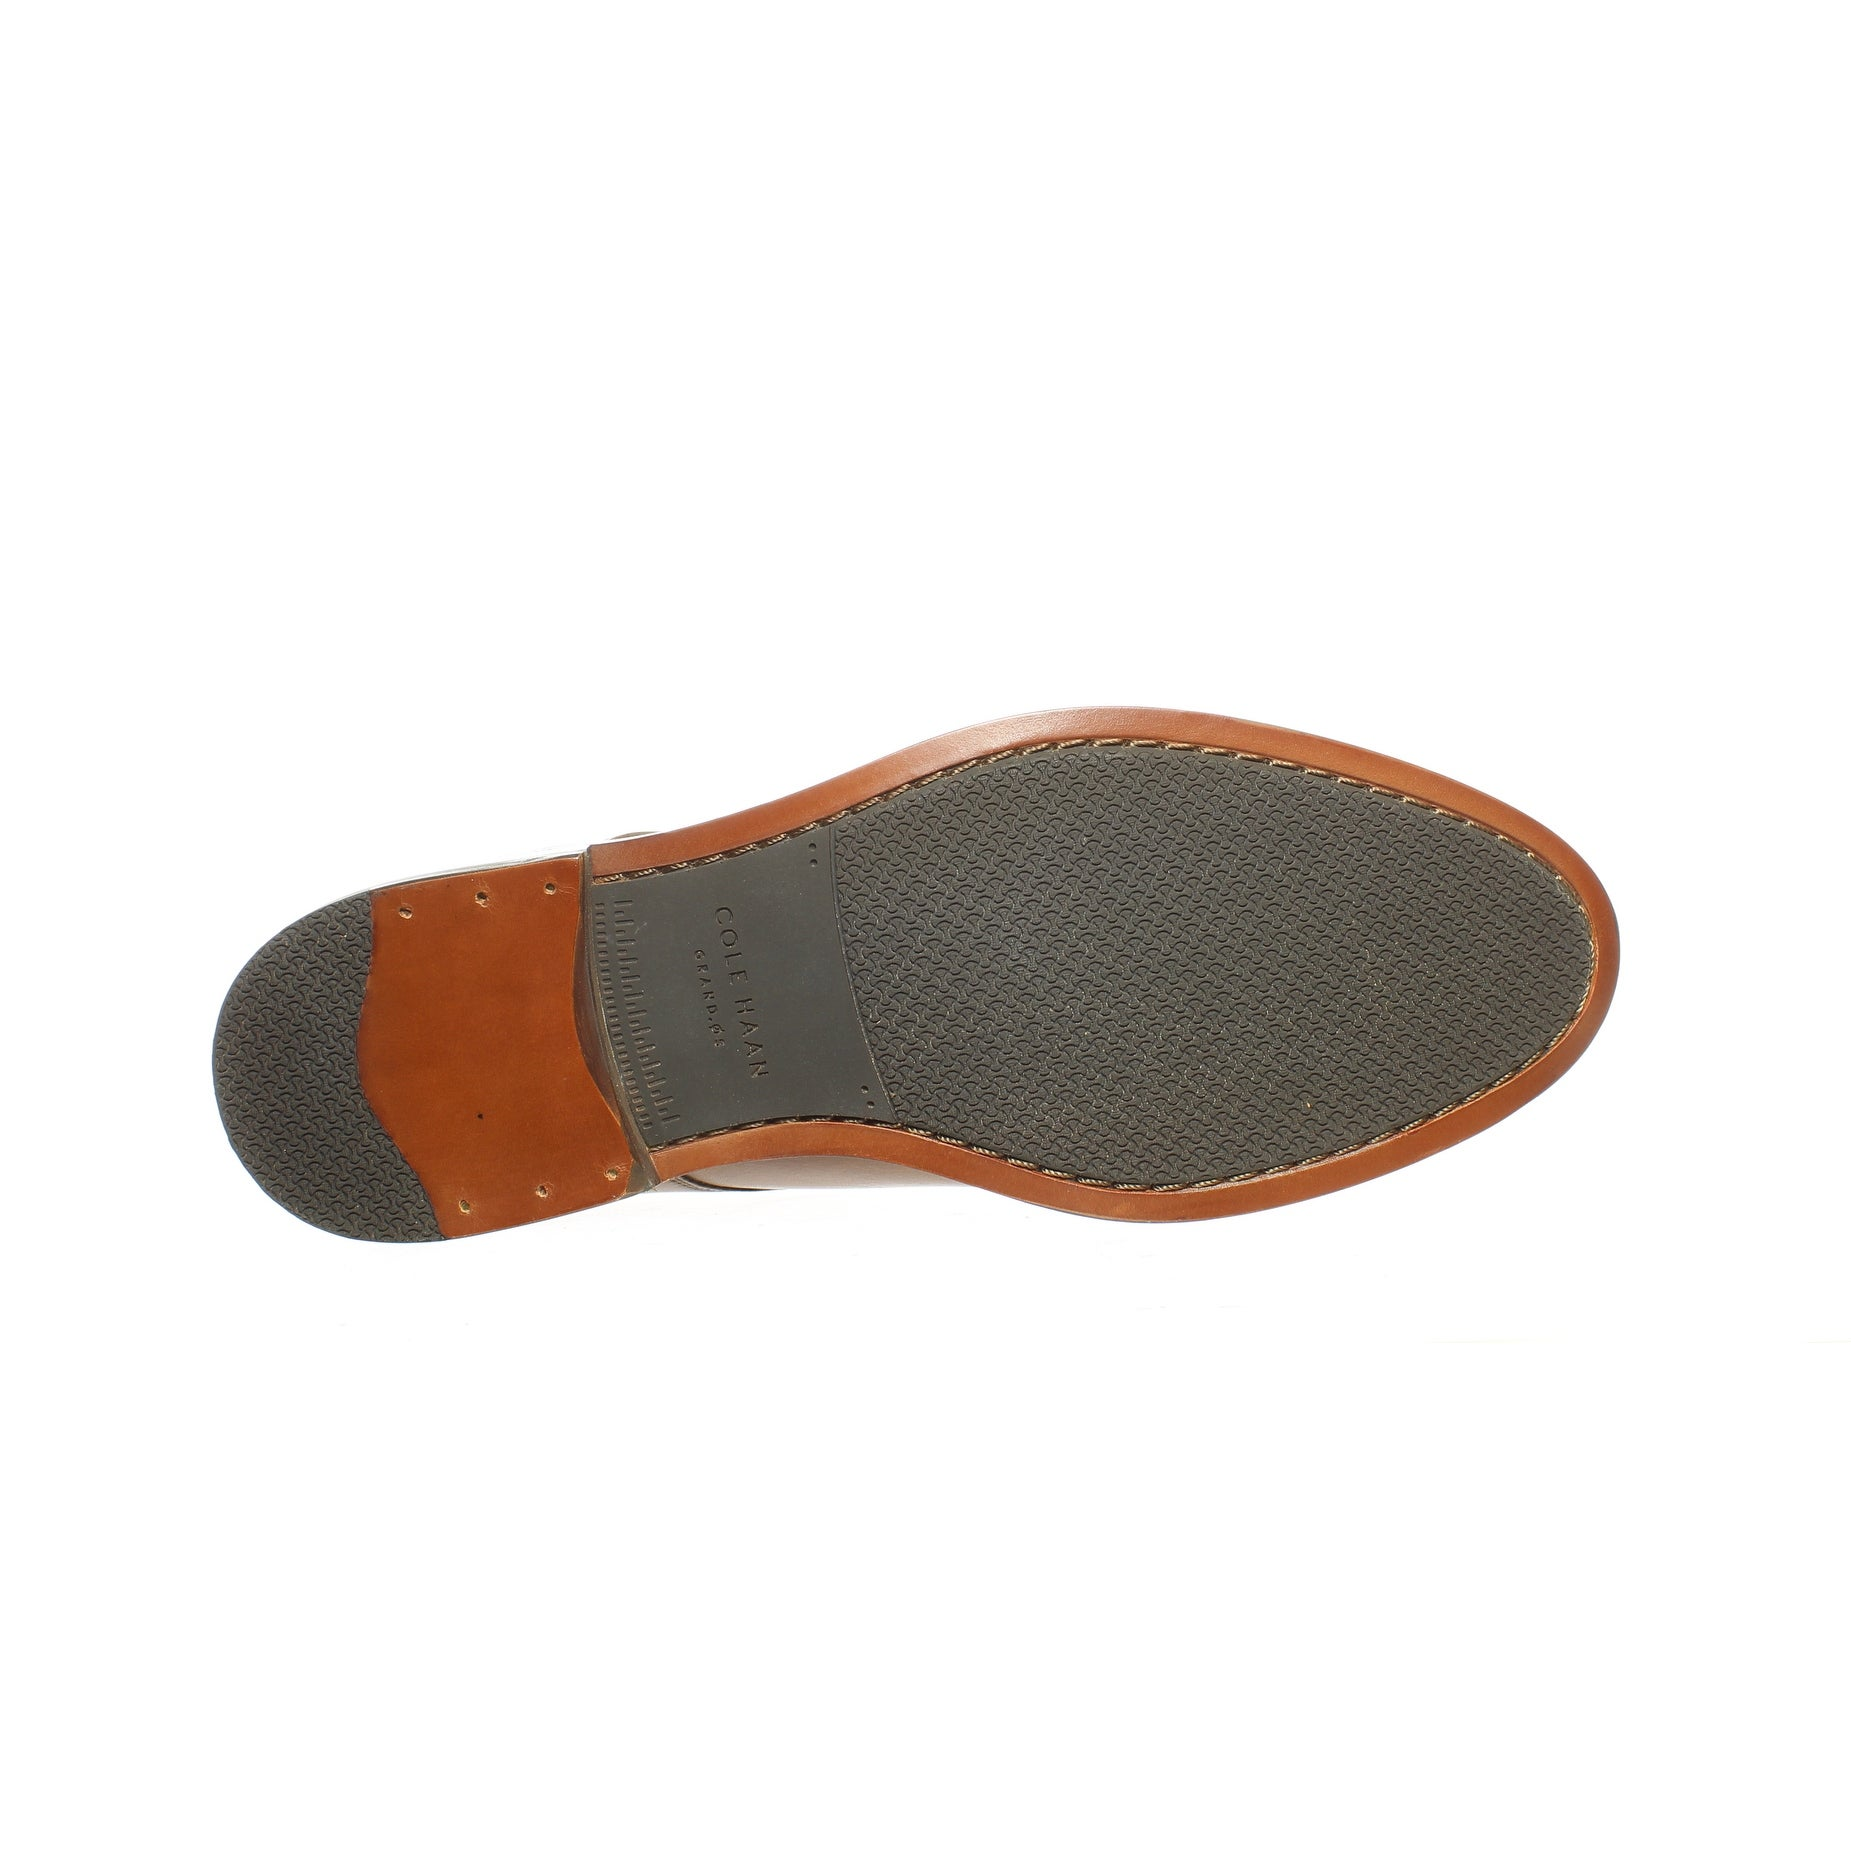 Cole Haan Mens Harrison Grand 2.0 British Tan Oxford Dress Shoe Size 11.5